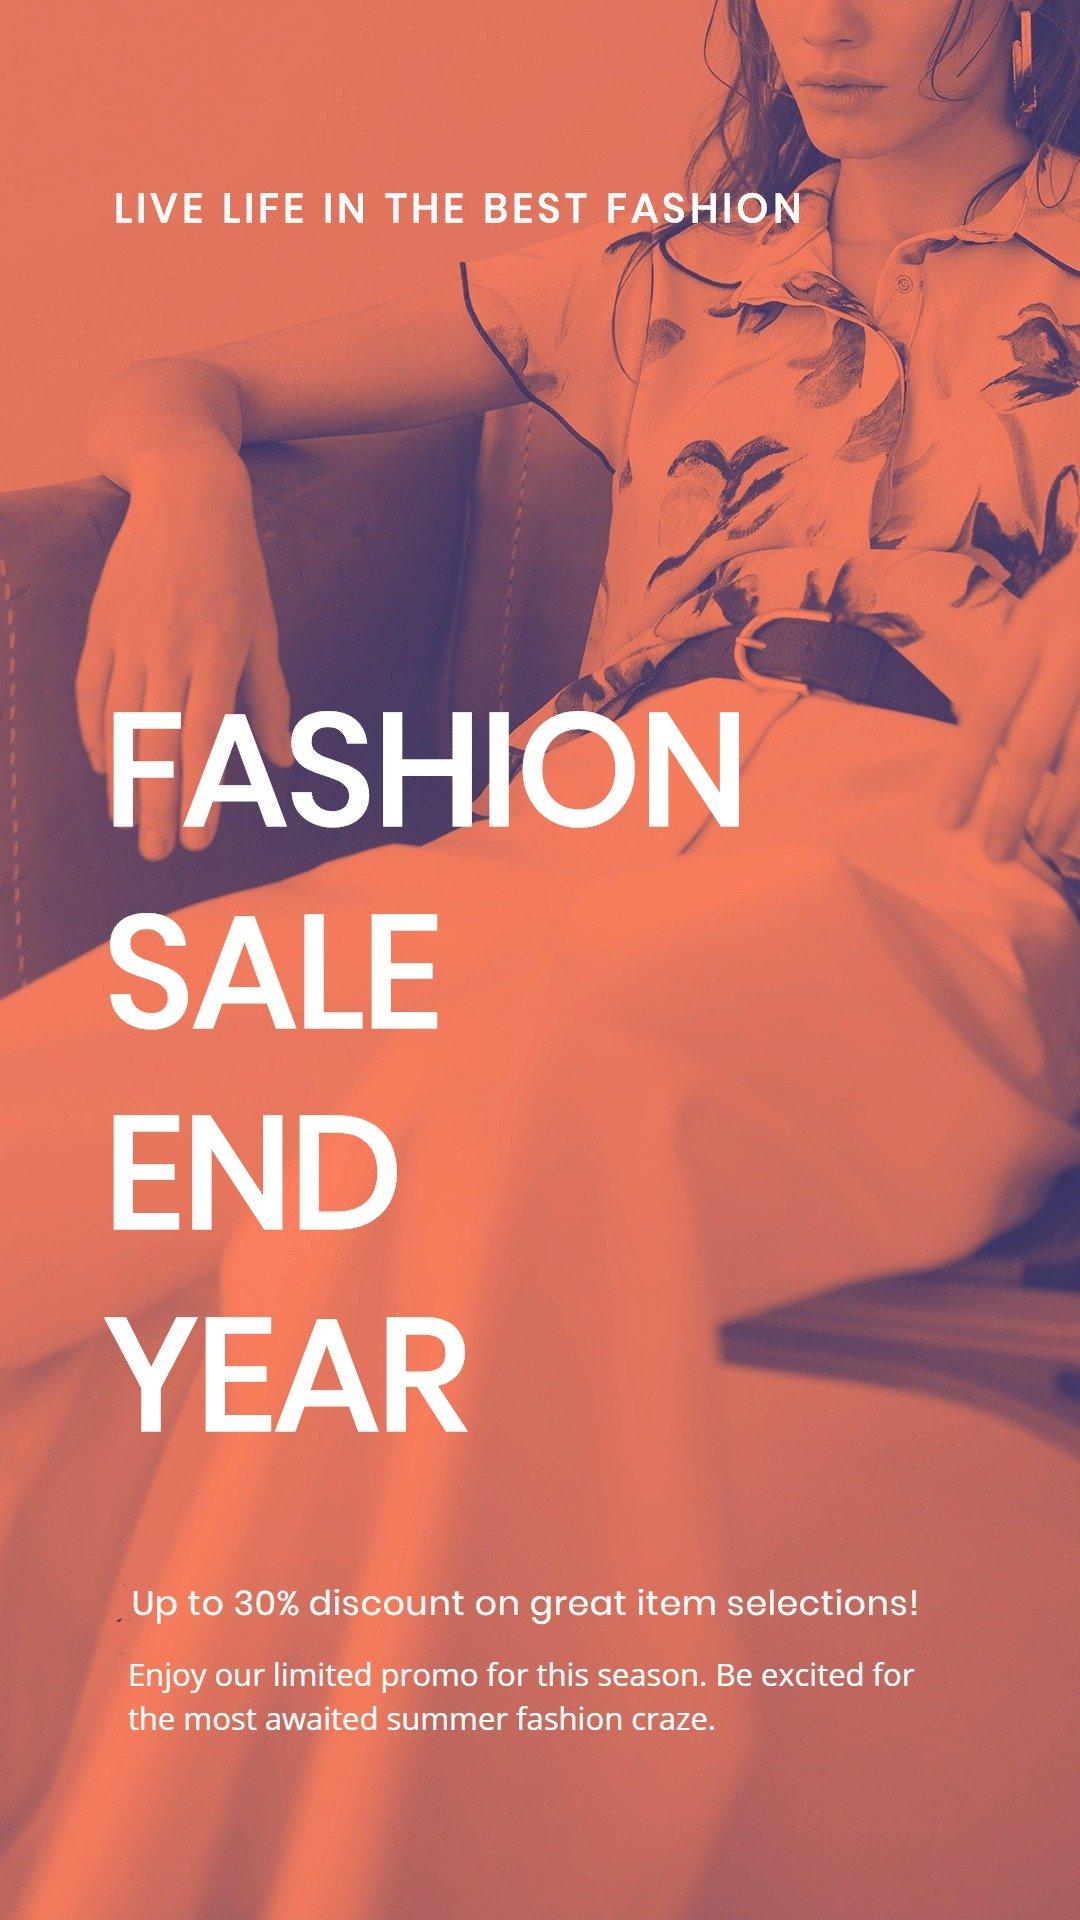 Minimalistic Fashion Sale Whatsapp Post Template